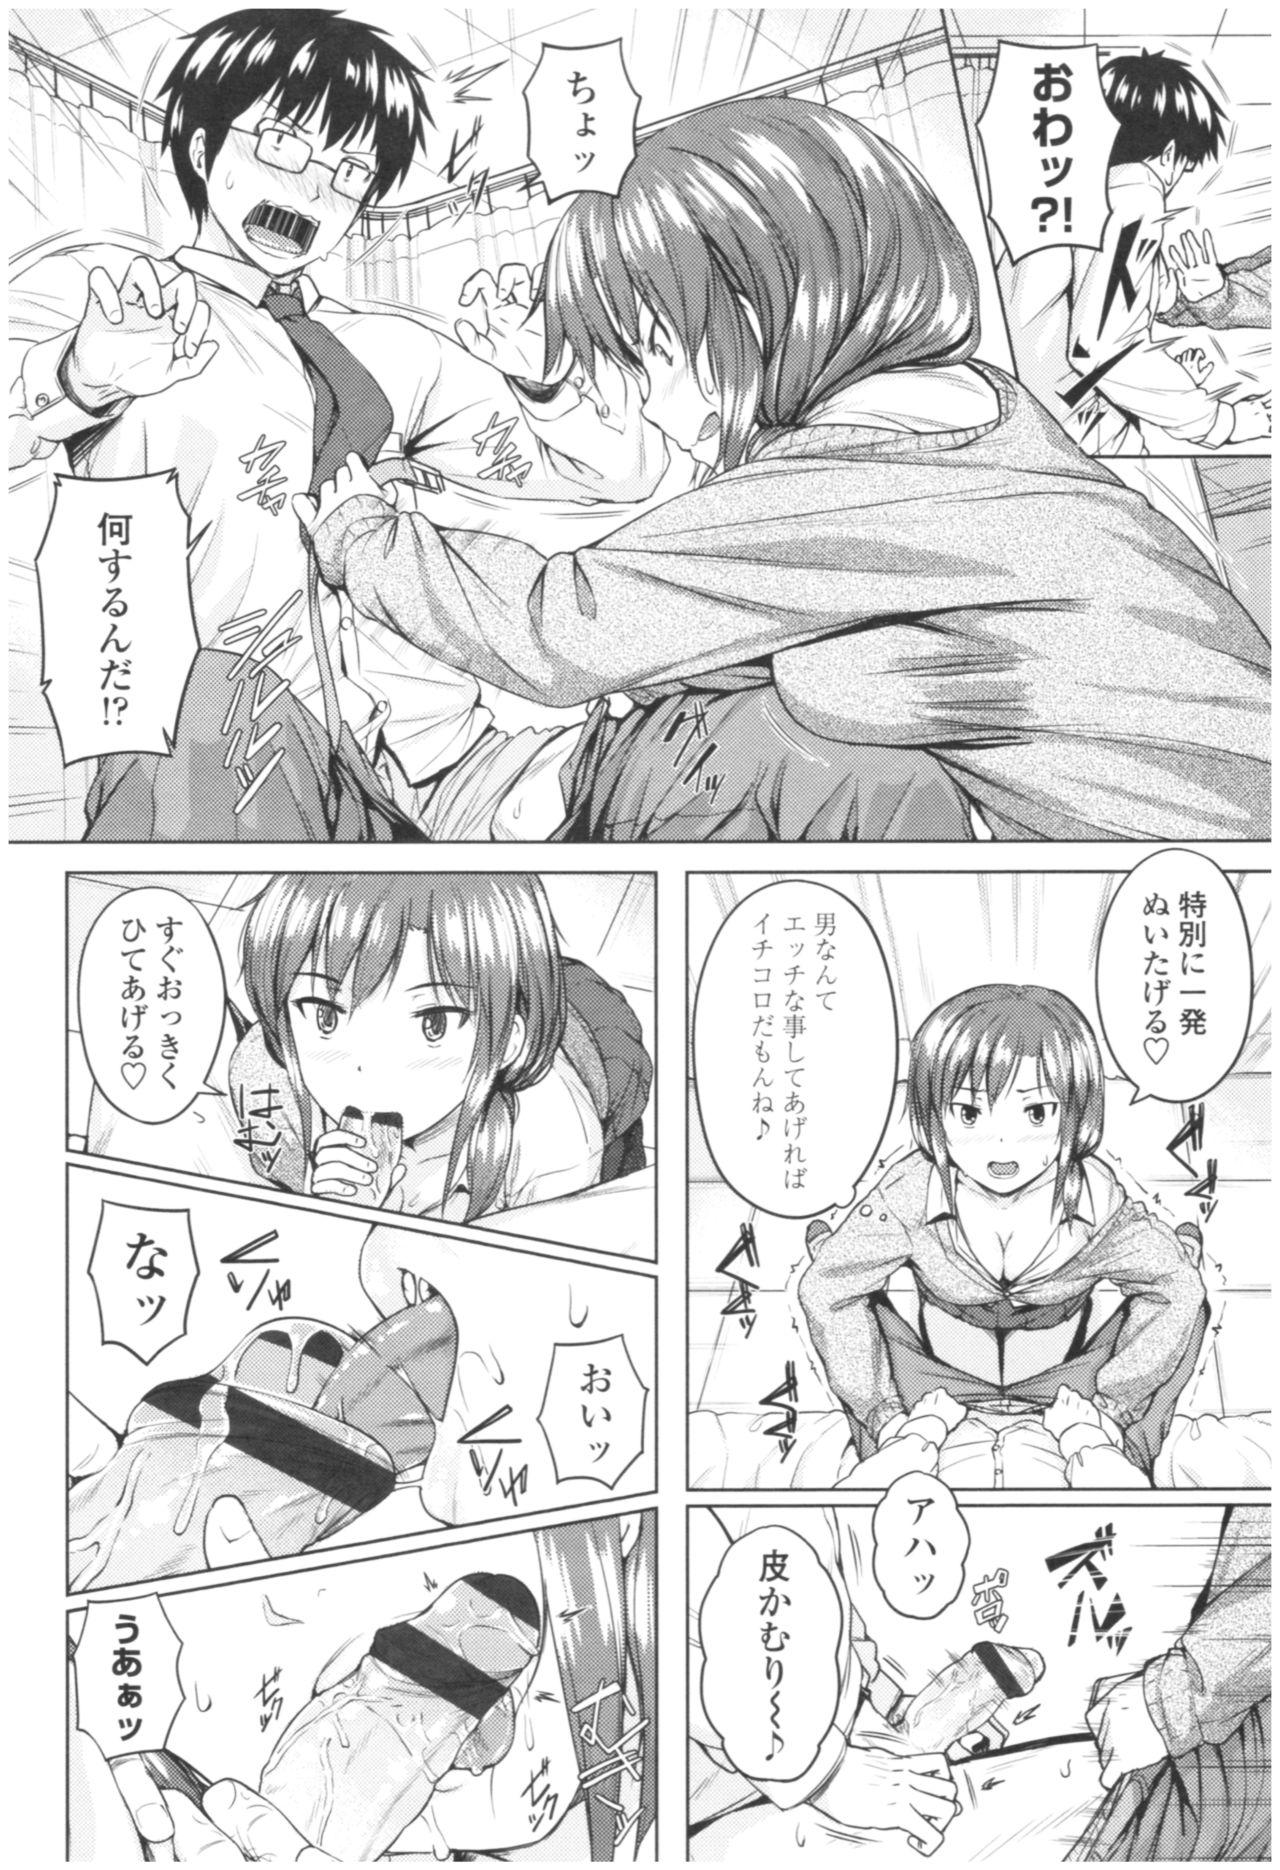 Bitch Kanojo no Hatsukoi Jouji - Her Lewd First Love and SEX 178